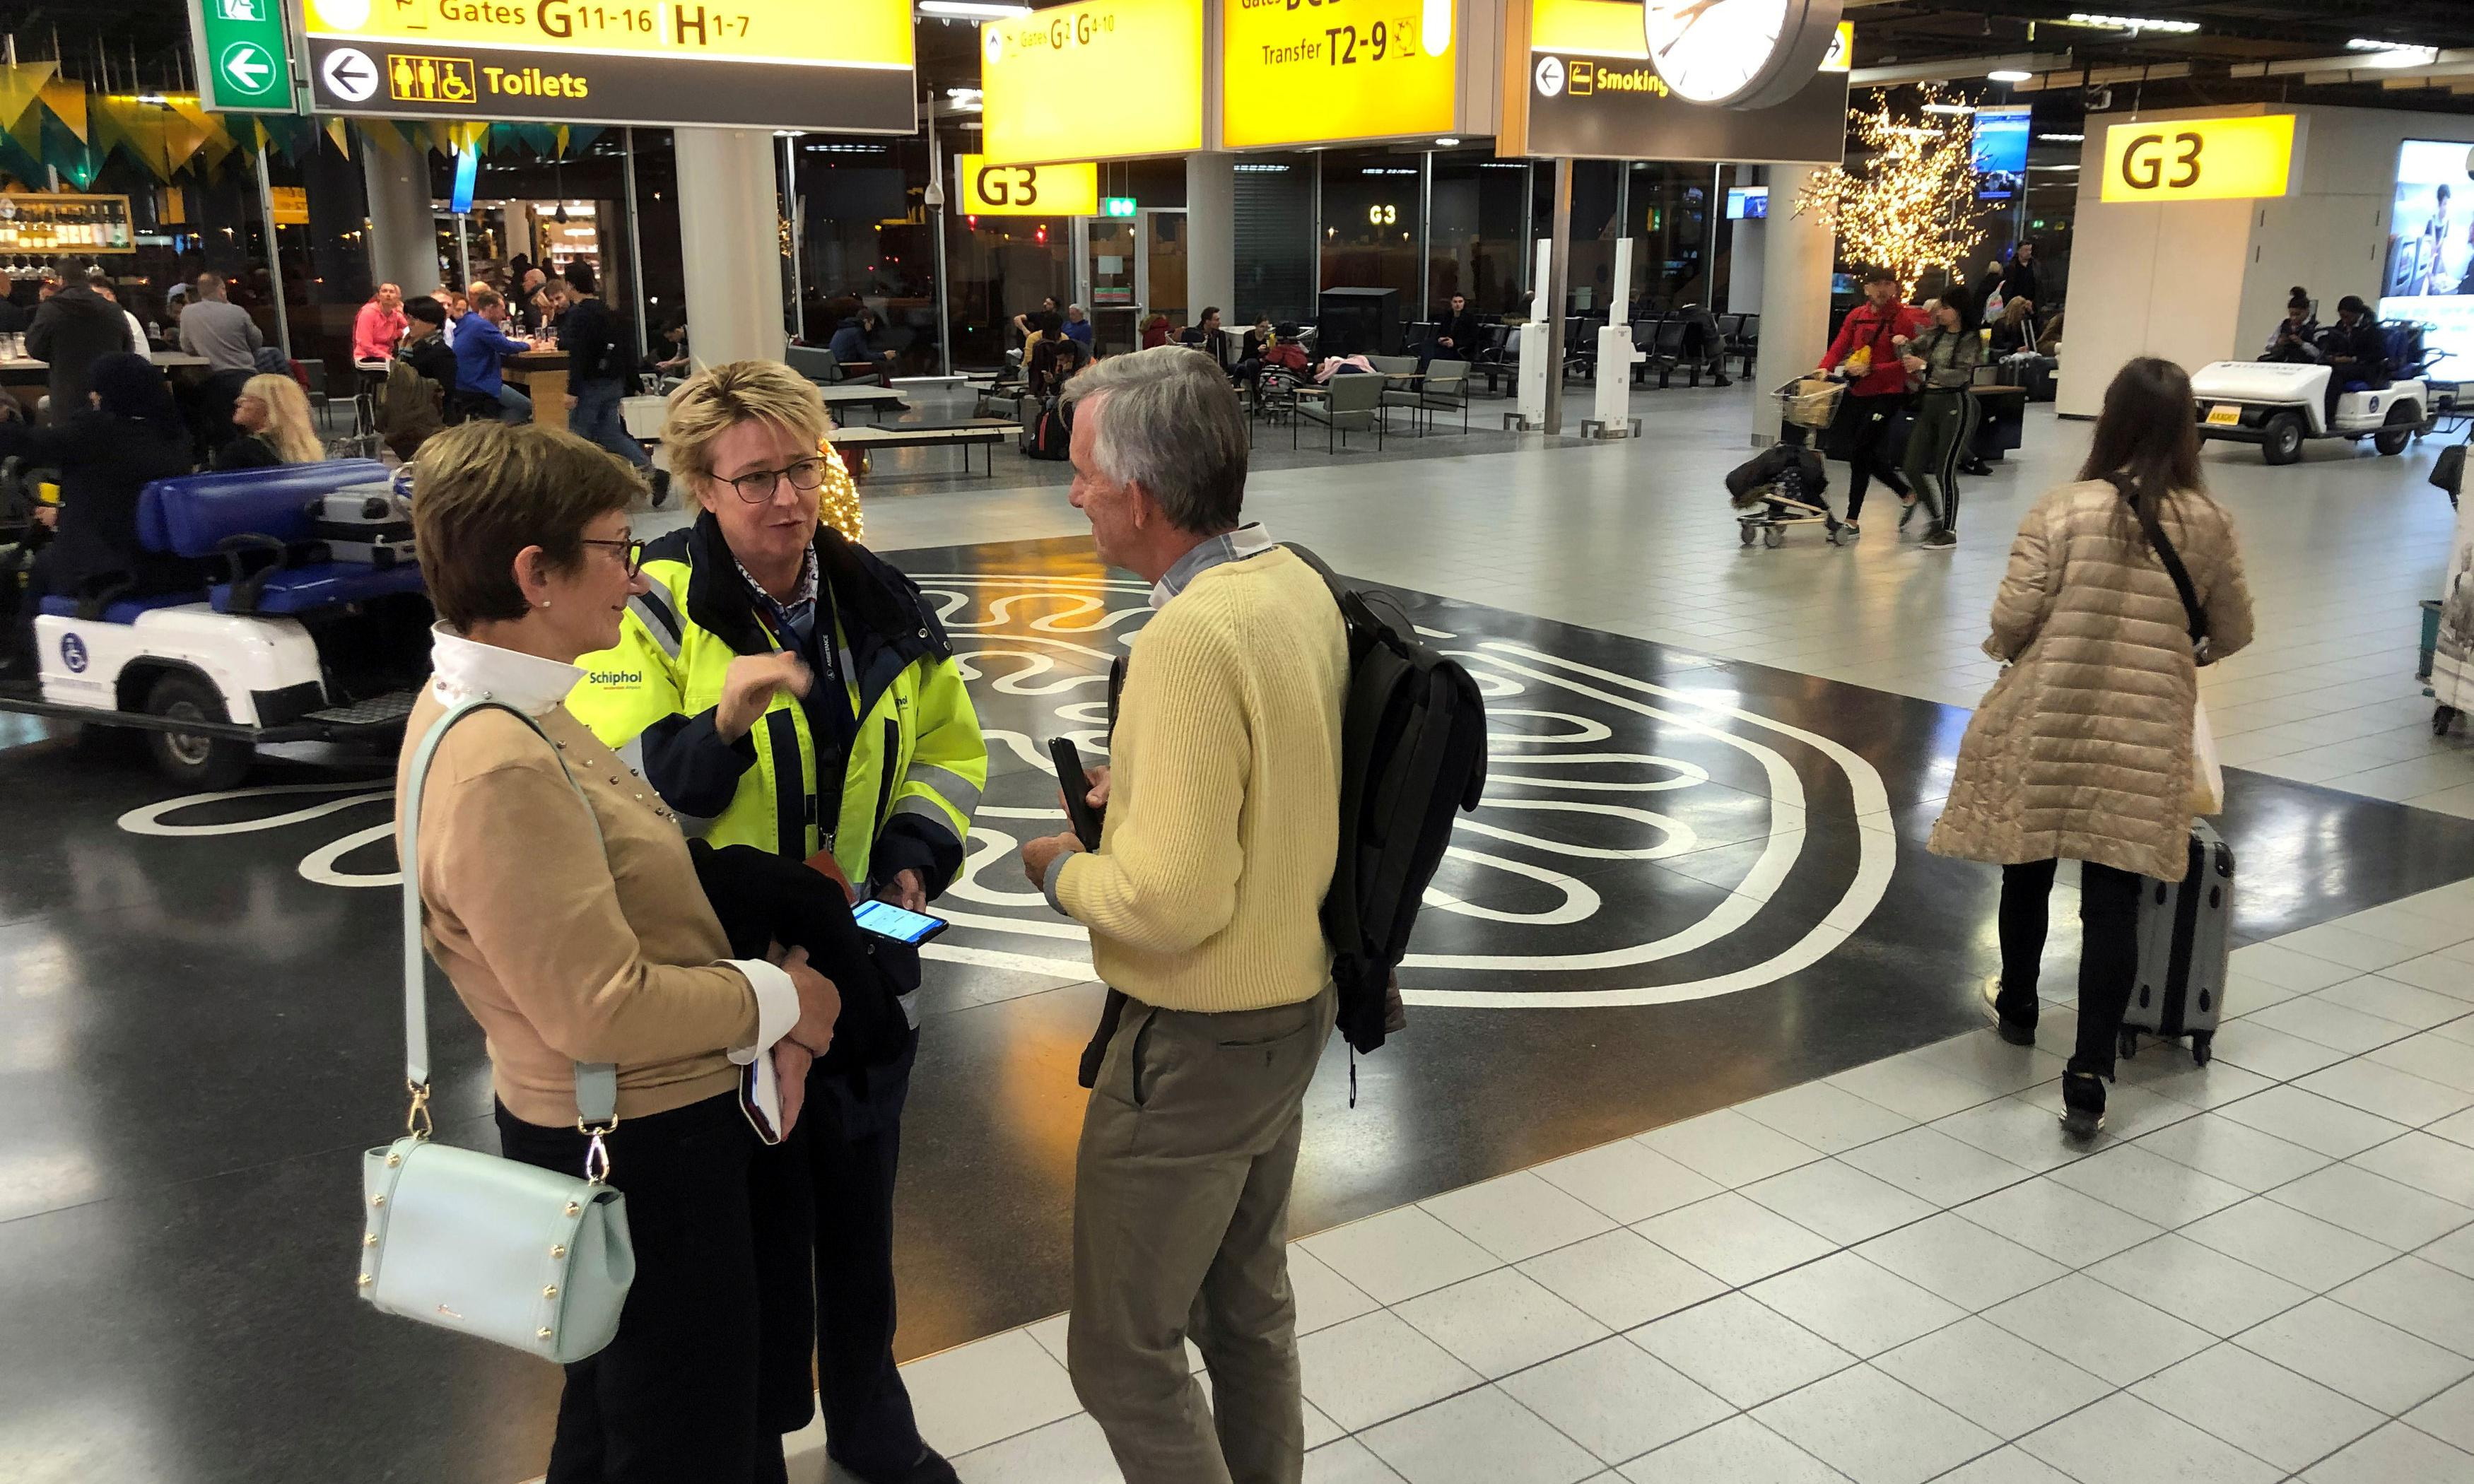 Schiphol security alert a false alarm caused by hijack warning sent in error